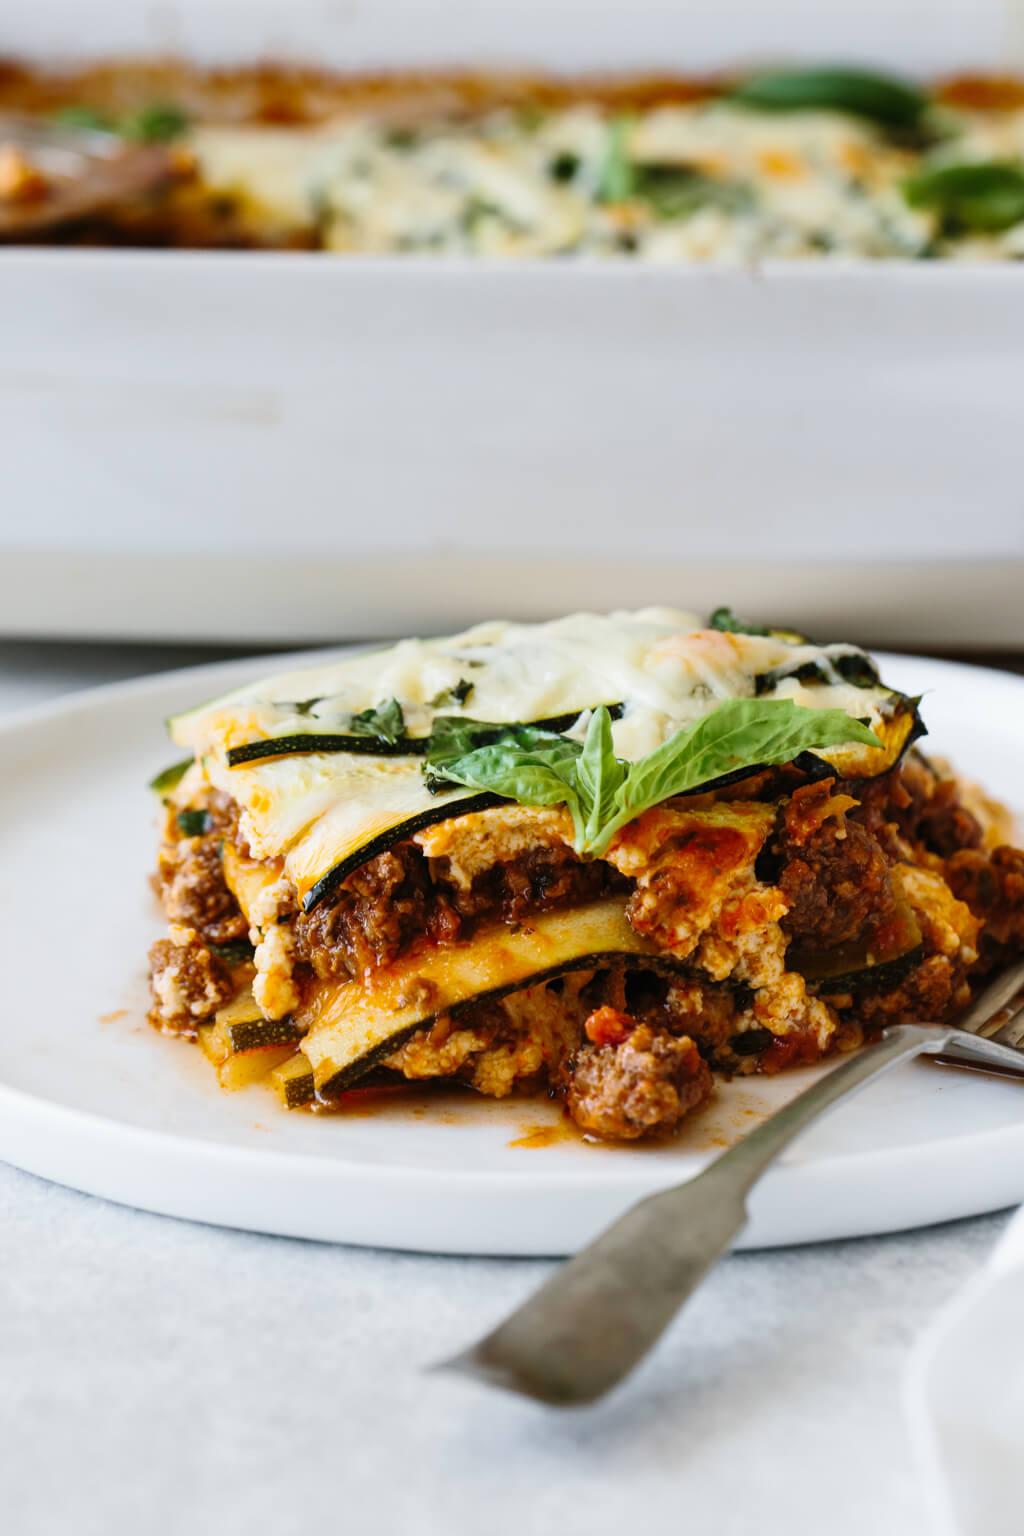 A single slice of zucchini lasagna on a plate.